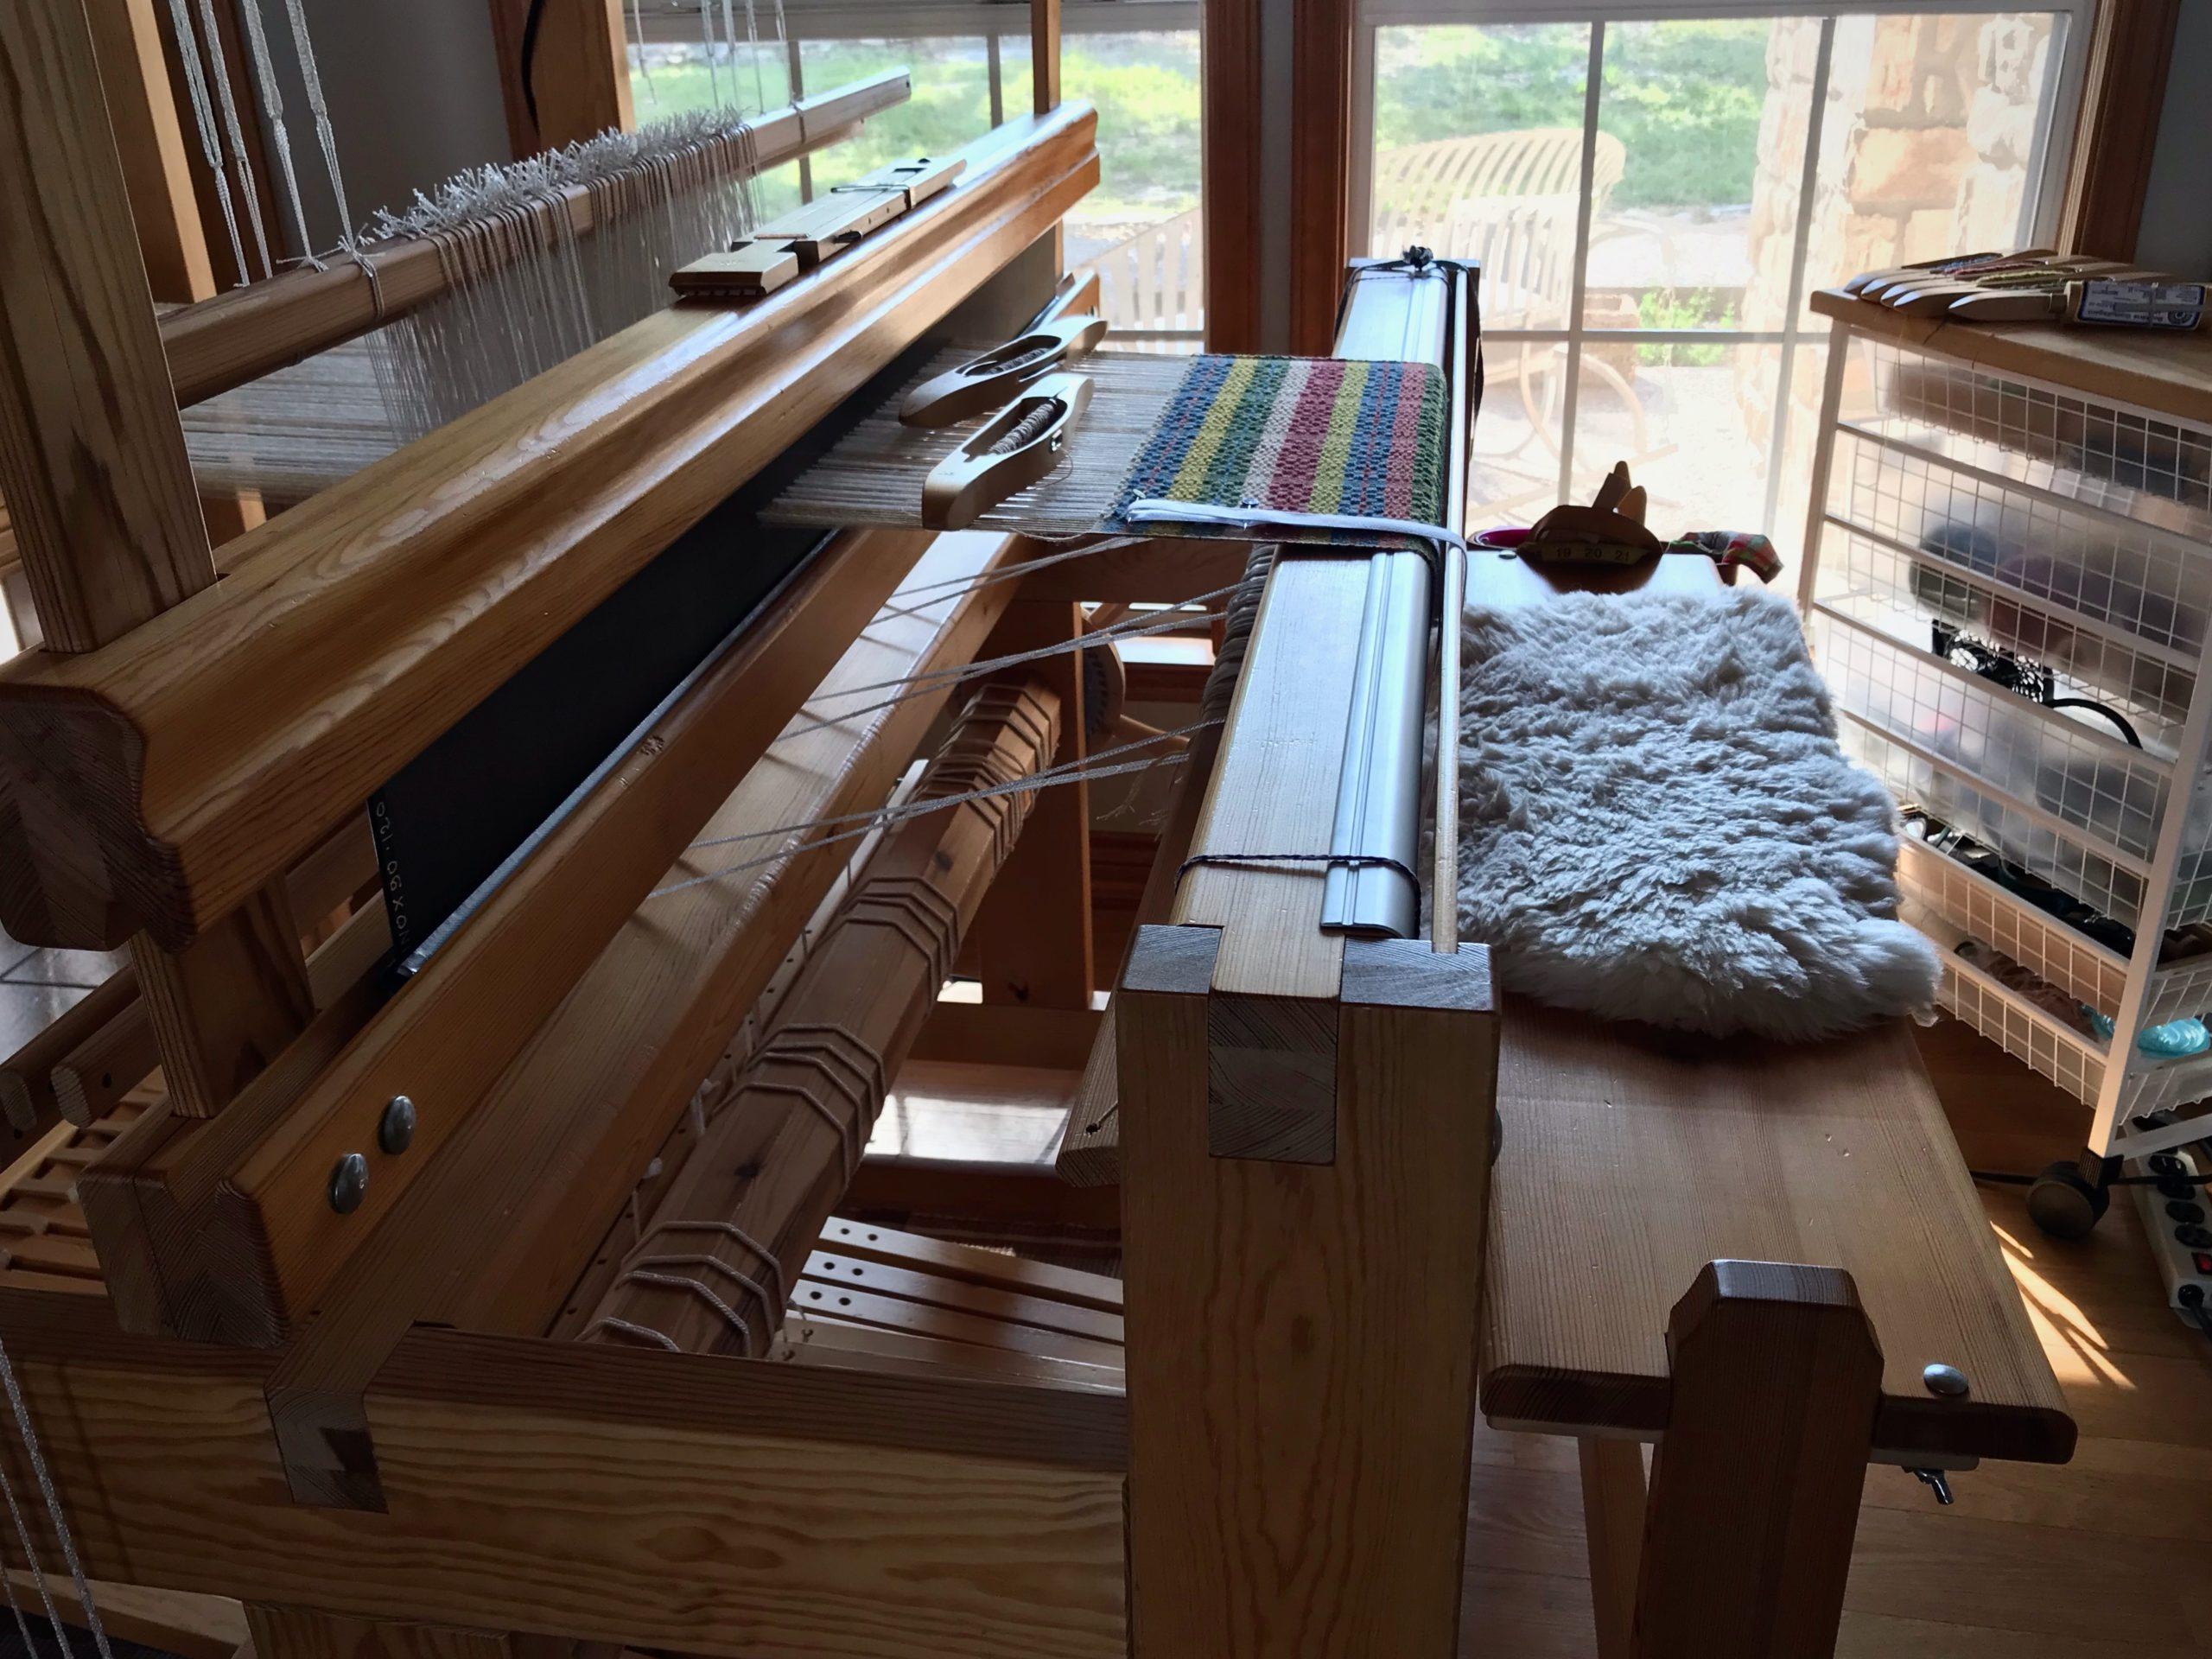 Swedish Monksbelt on a Glimakra Standard loom.